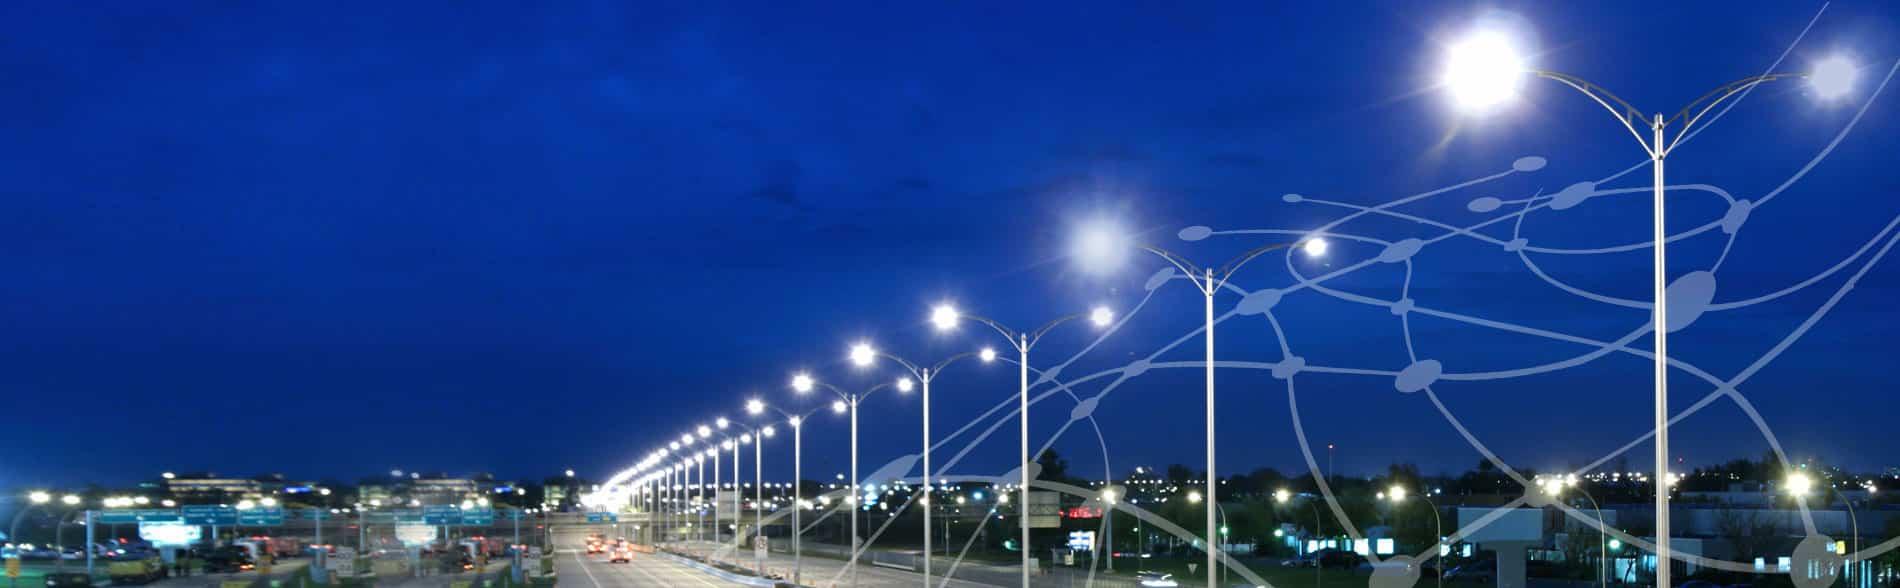 Wireless lighting control, wireless smart lighting, wireless DALI ...